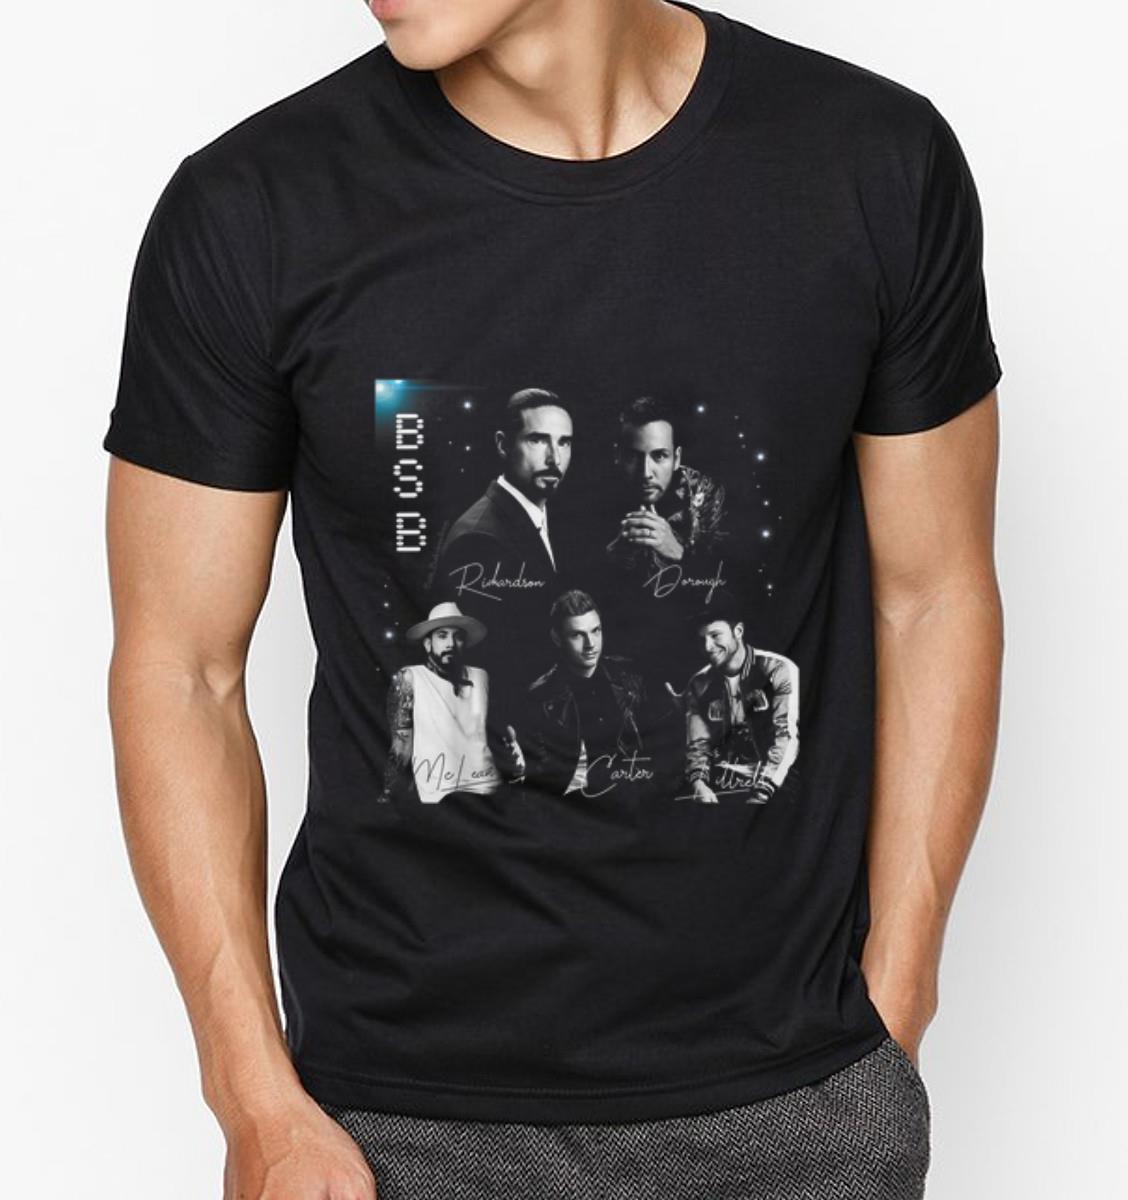 Backstreet Boys Christmas Sweater.Top Backstreet Boy Member Signature Bsb Shirt